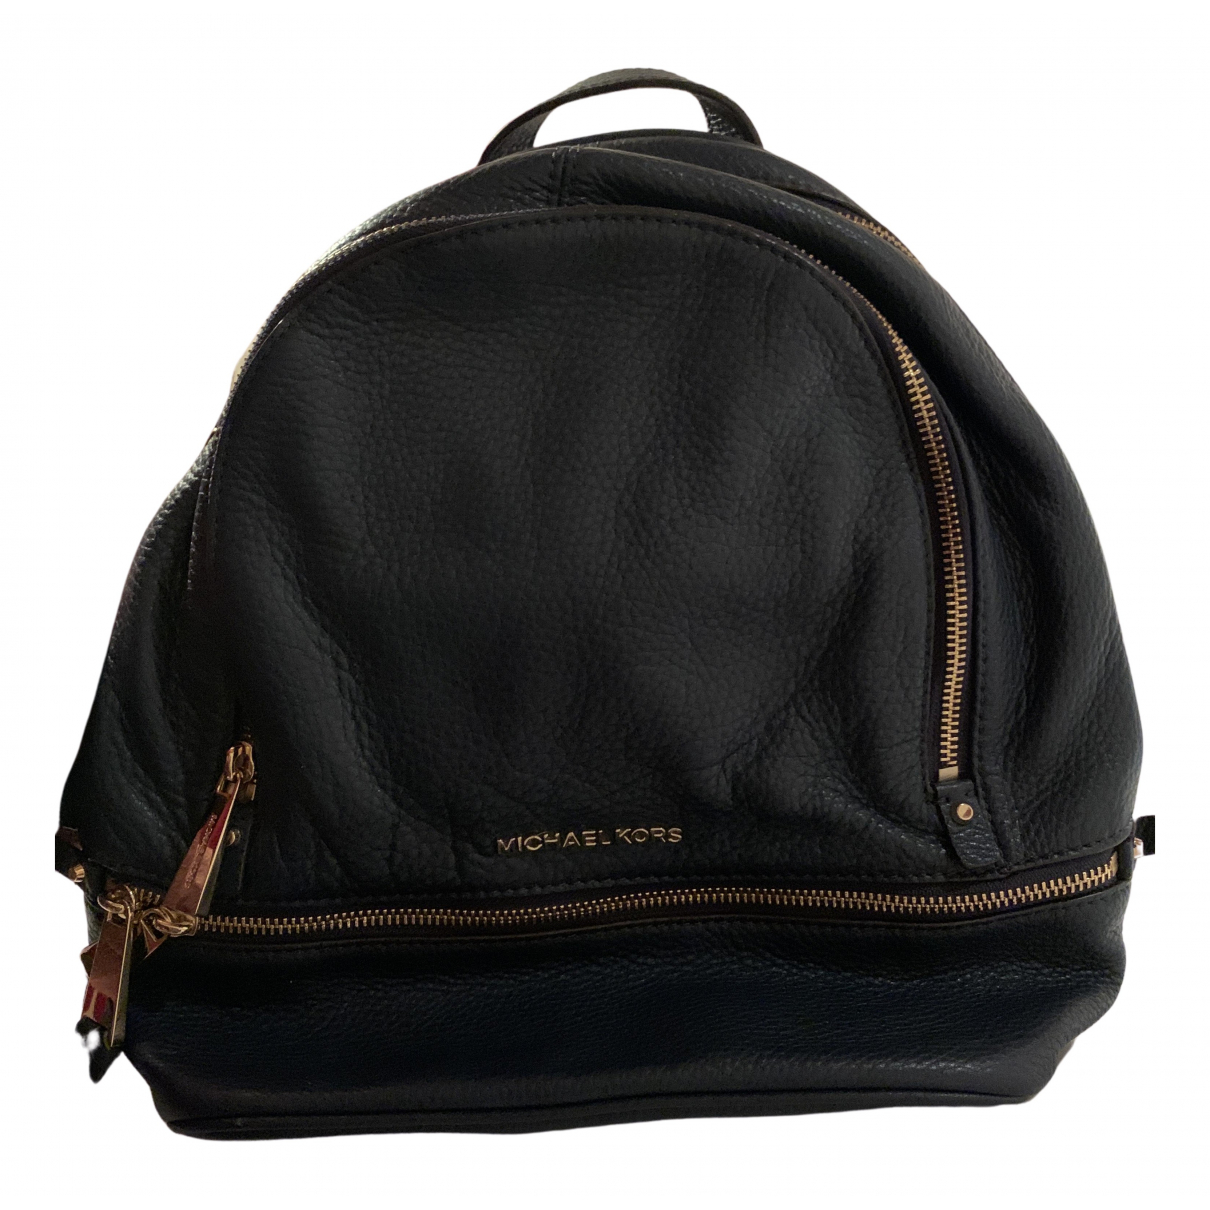 Michael Kors Rhea Blue Leather backpack for Women N